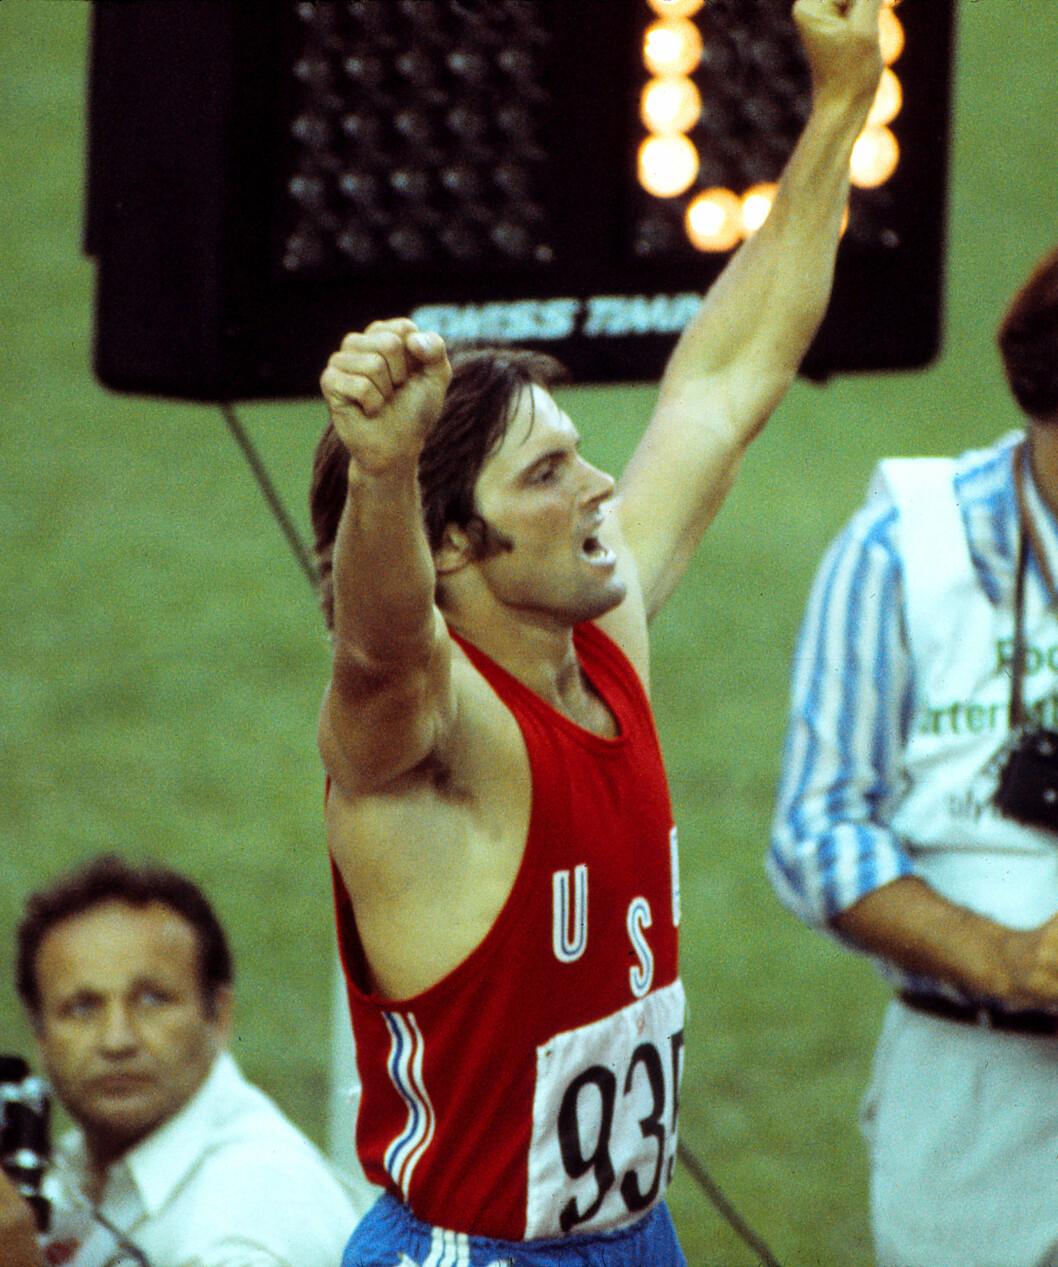 IDRETTSHELT: Bruce Jenner jublende etter at OL-gullet i tikamp var et faktum under OL i Montreal i 1976.  Foto: (c) Colorsport/Corbis/All Over Press